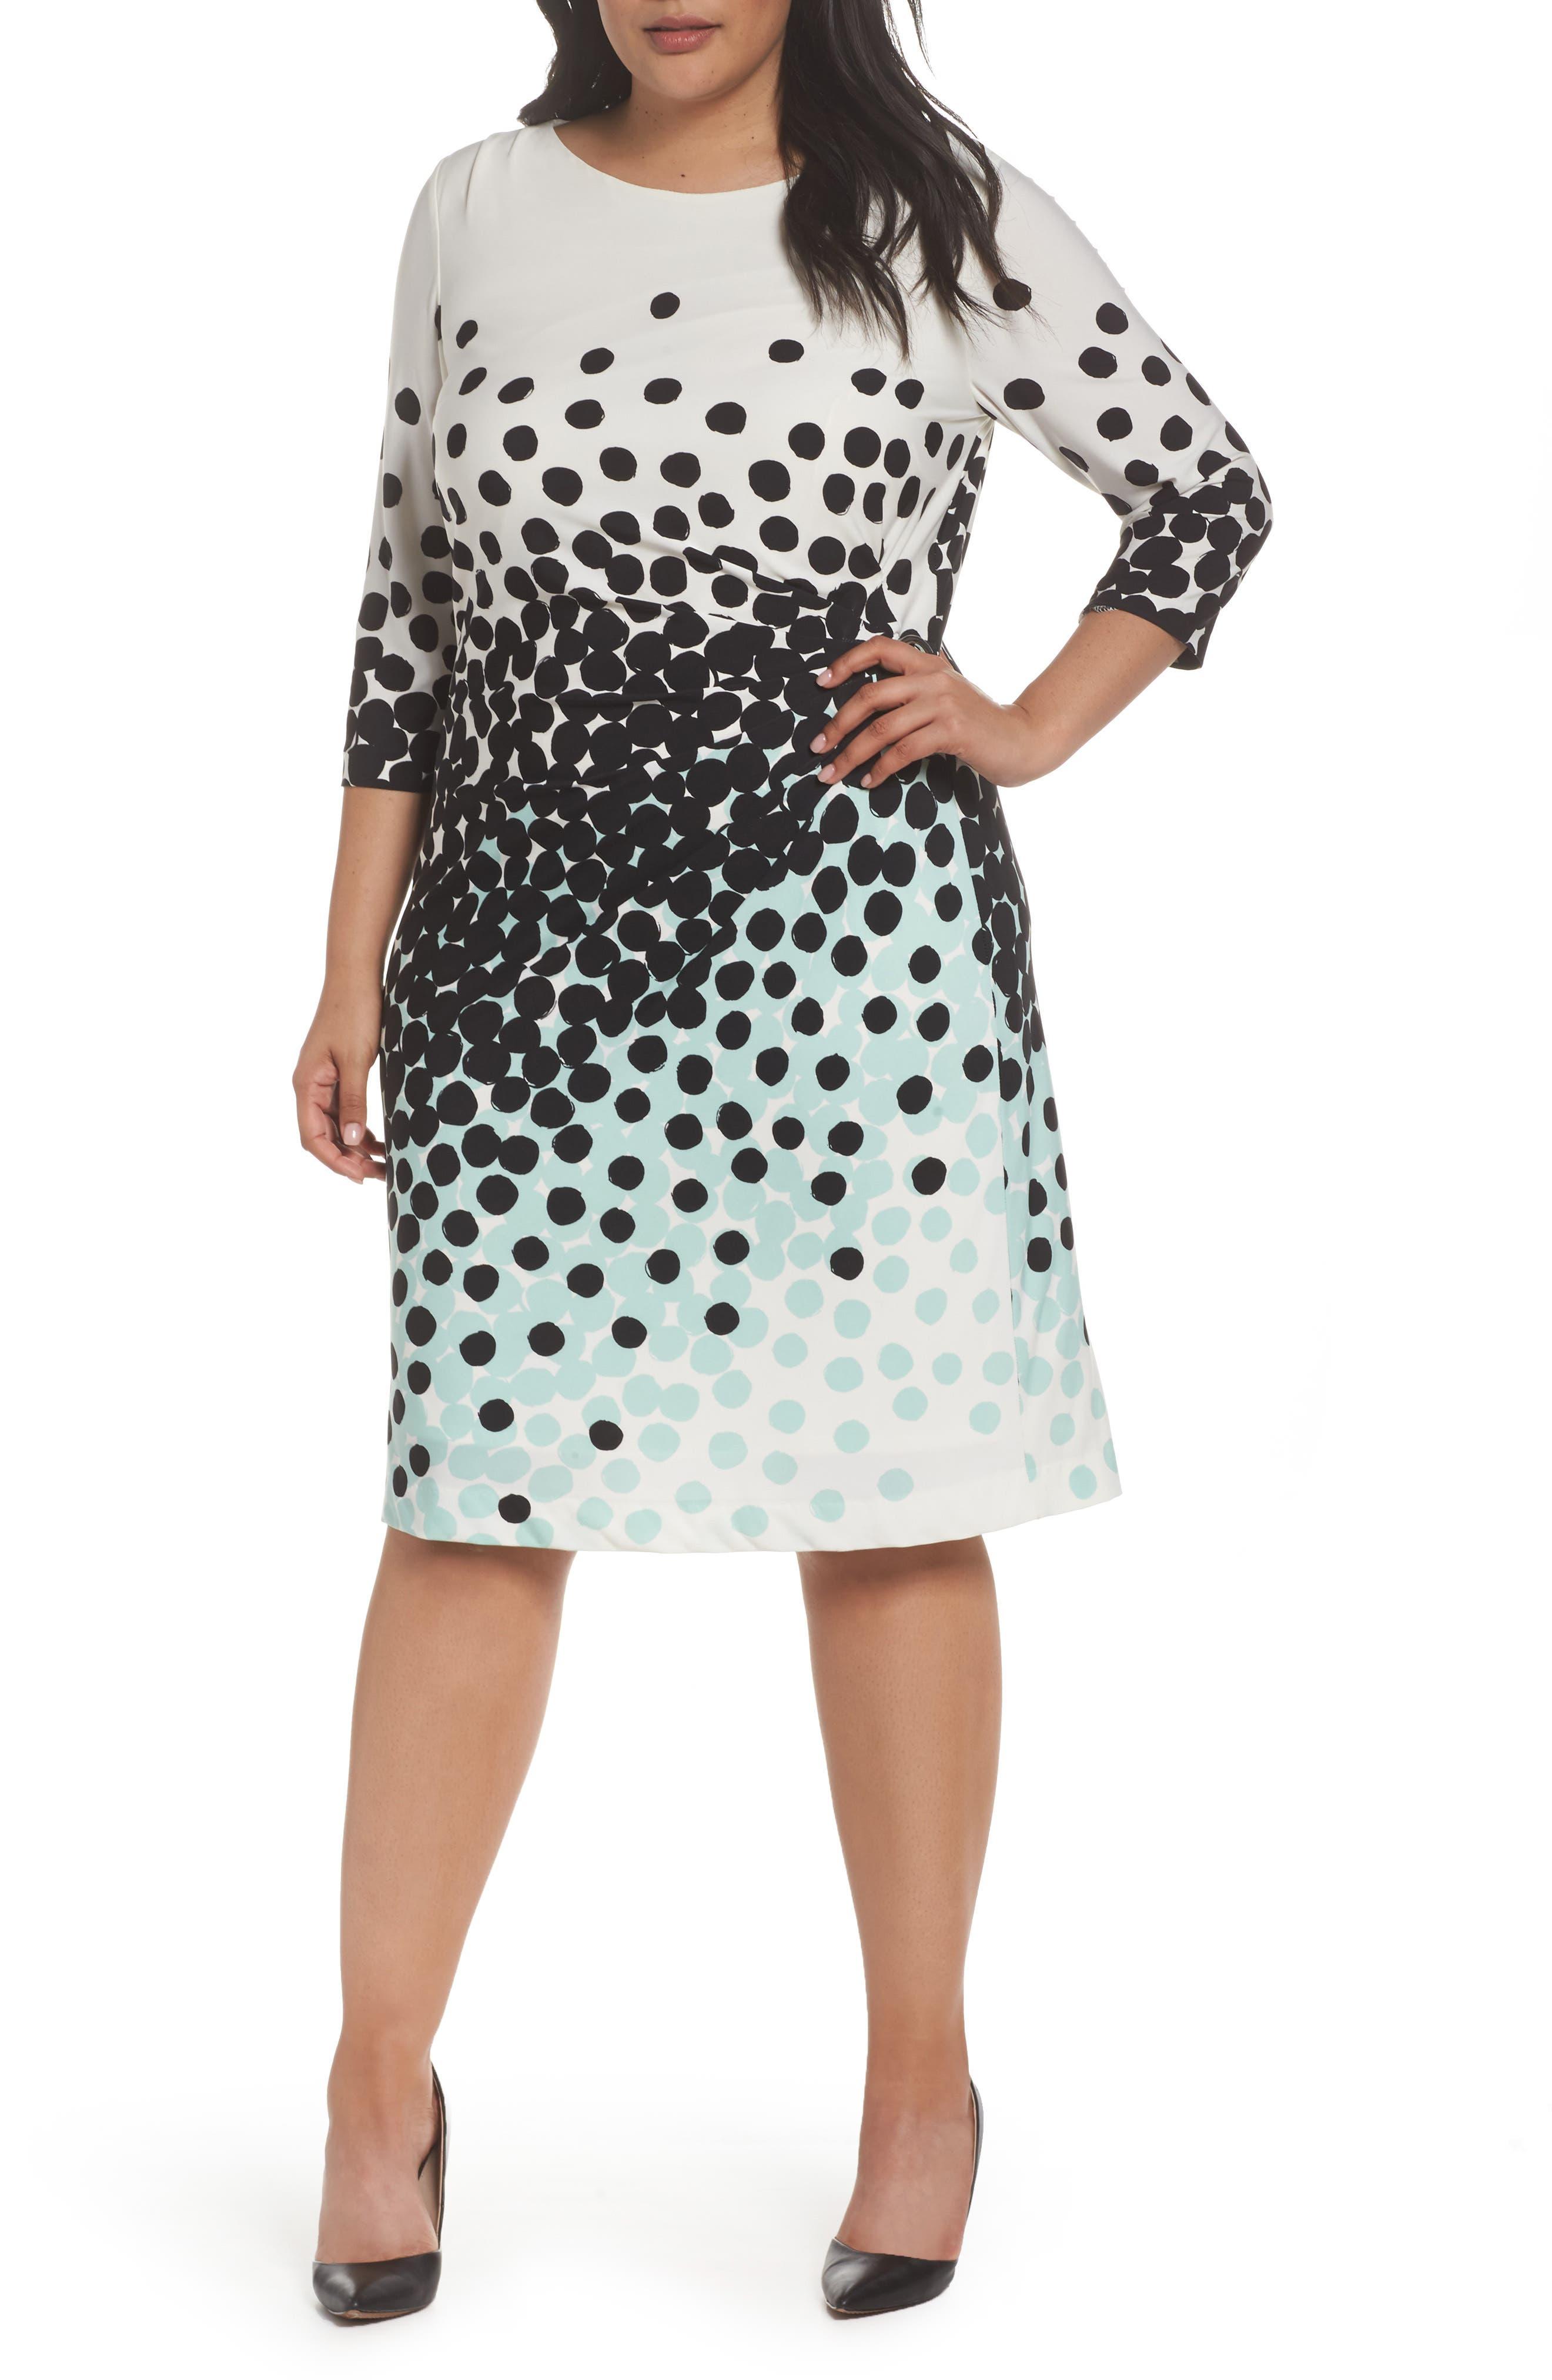 Alternate Image 1 Selected - Tahari Dot Print Sheath Dress (Plus Size)